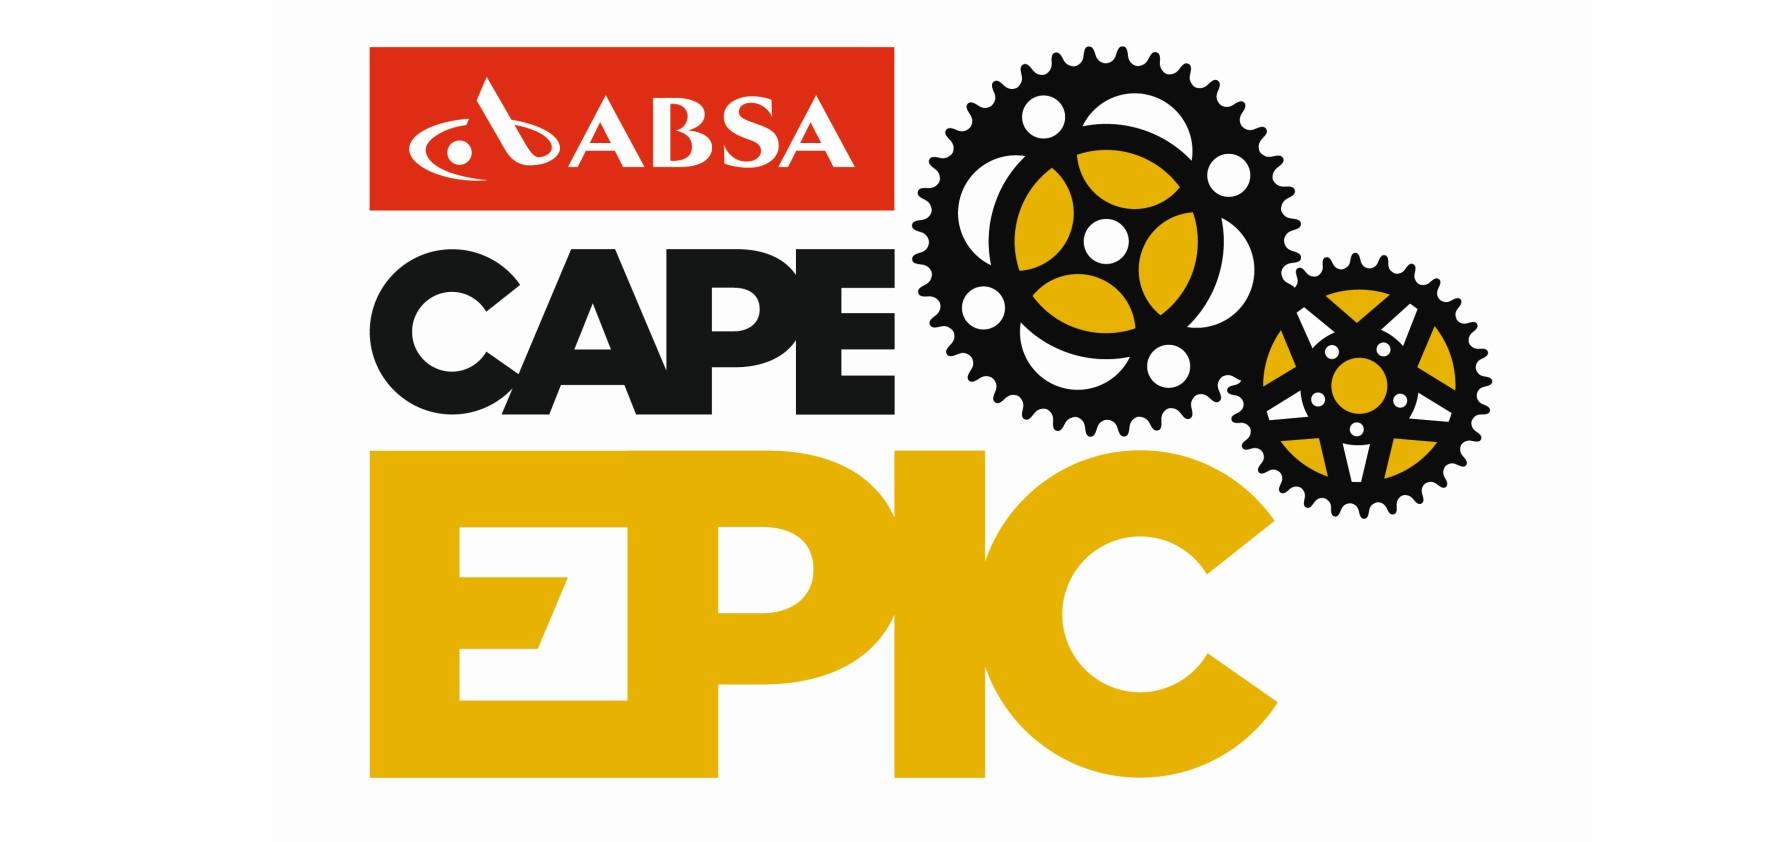 Absa Cape Epic 2015 – zapowiedź.